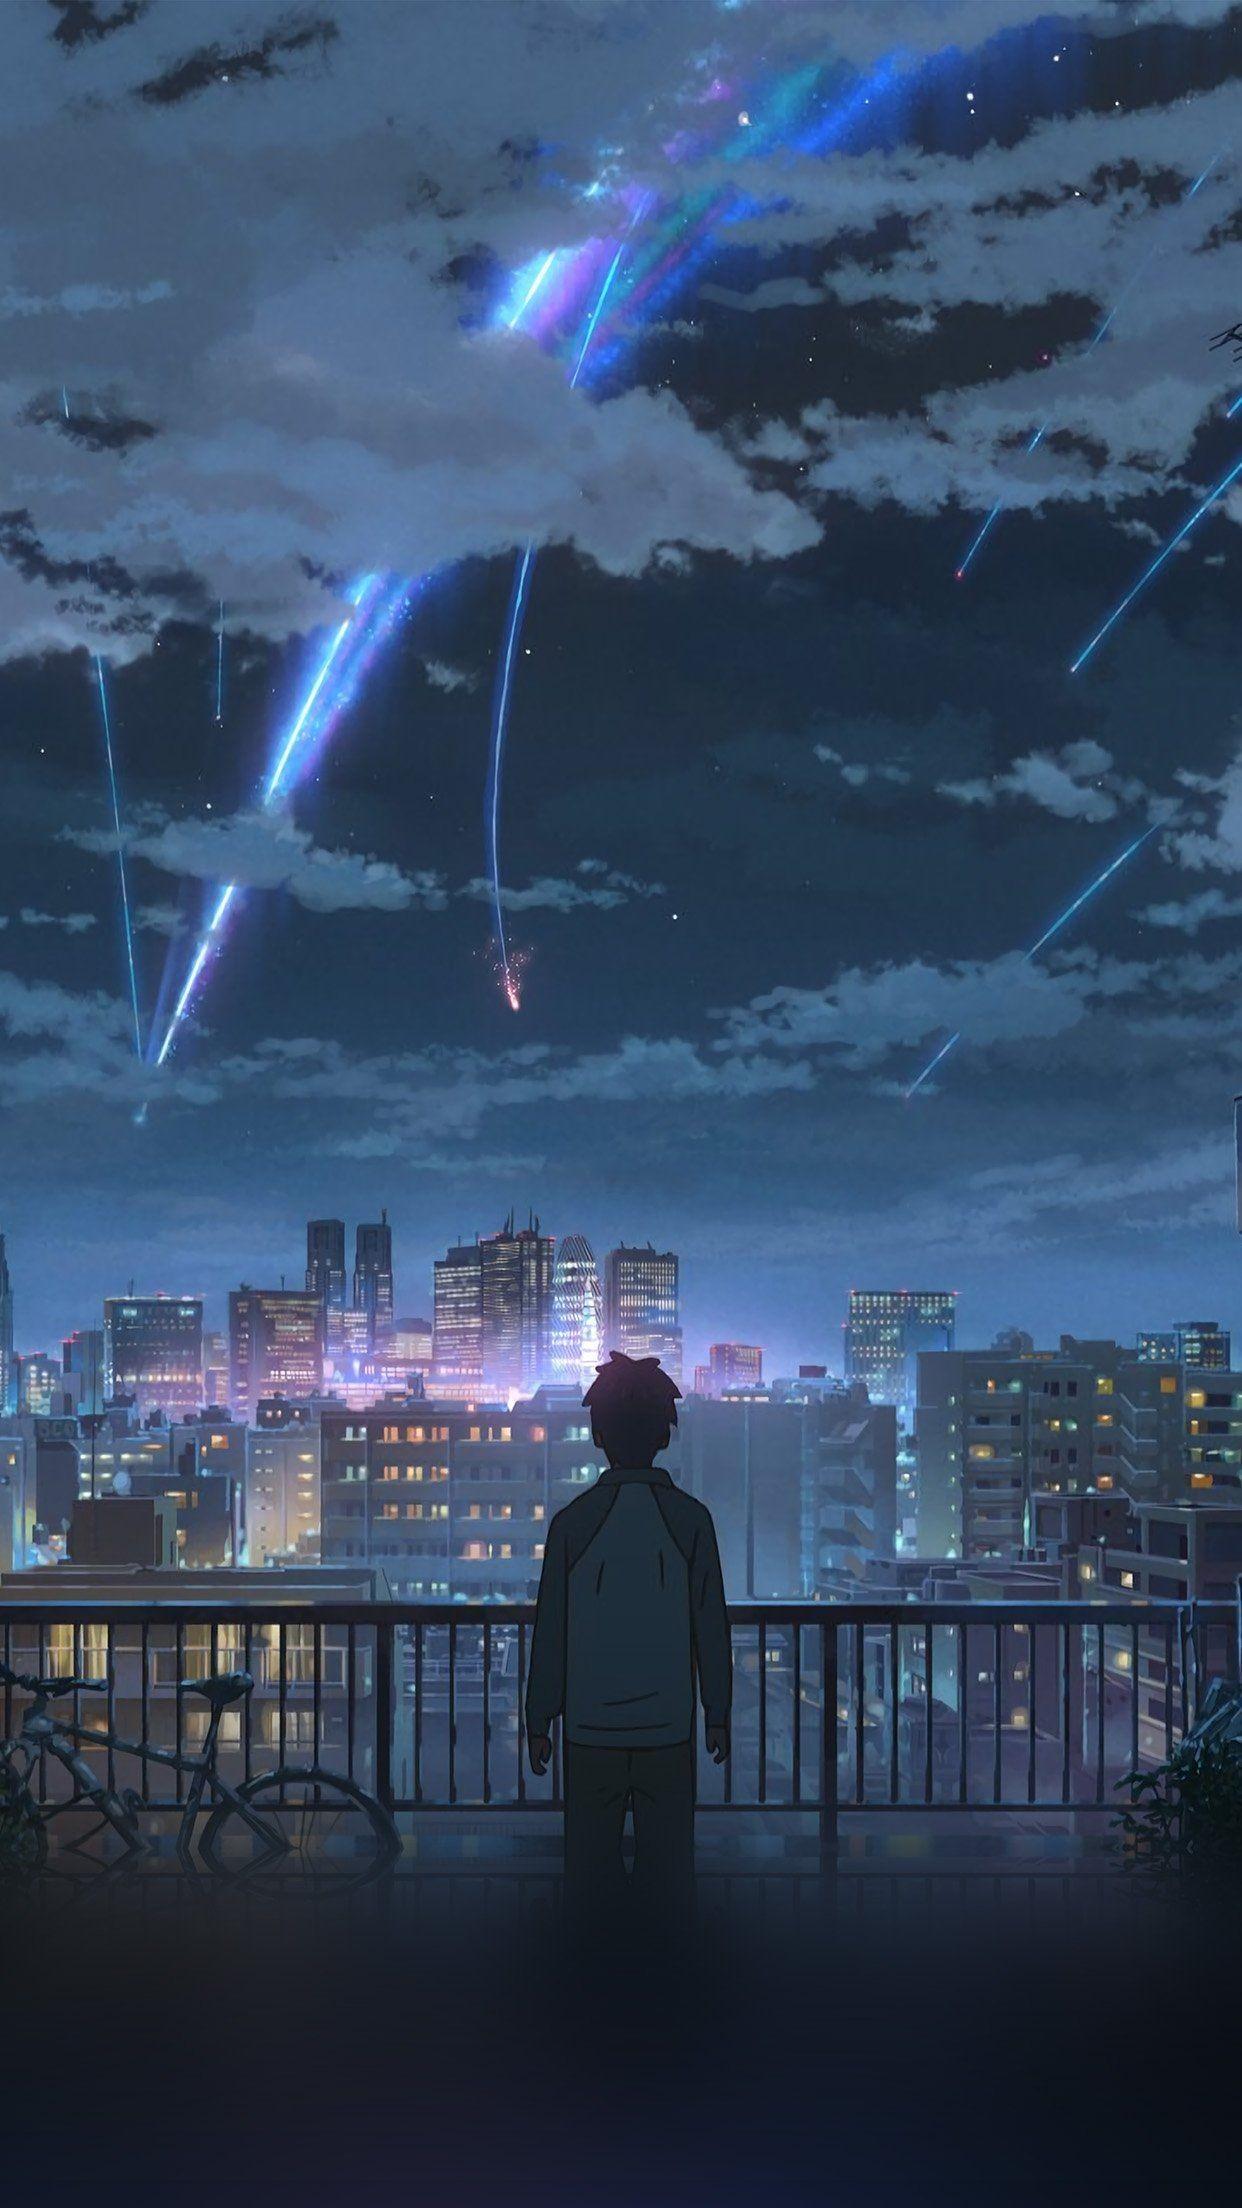 Peaceful Anime Background : peaceful, anime, background, Peaceful, Japanese, Anime, Wallpapers, Wallpaper